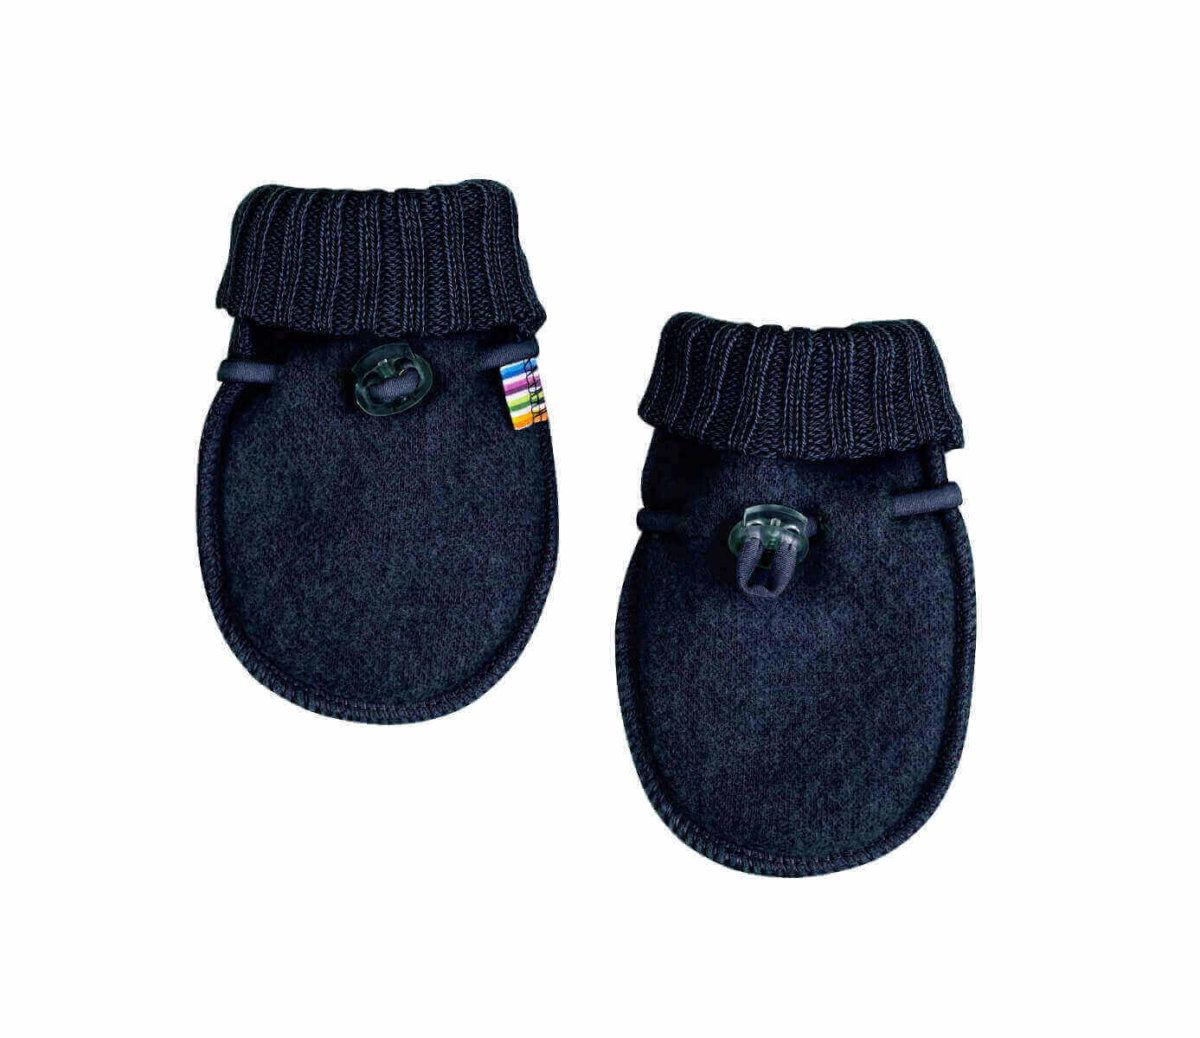 Joha OEKO TEX® børstet uld luffer, 100% merino uld i beige til børn hos Scandinaivanlux.com